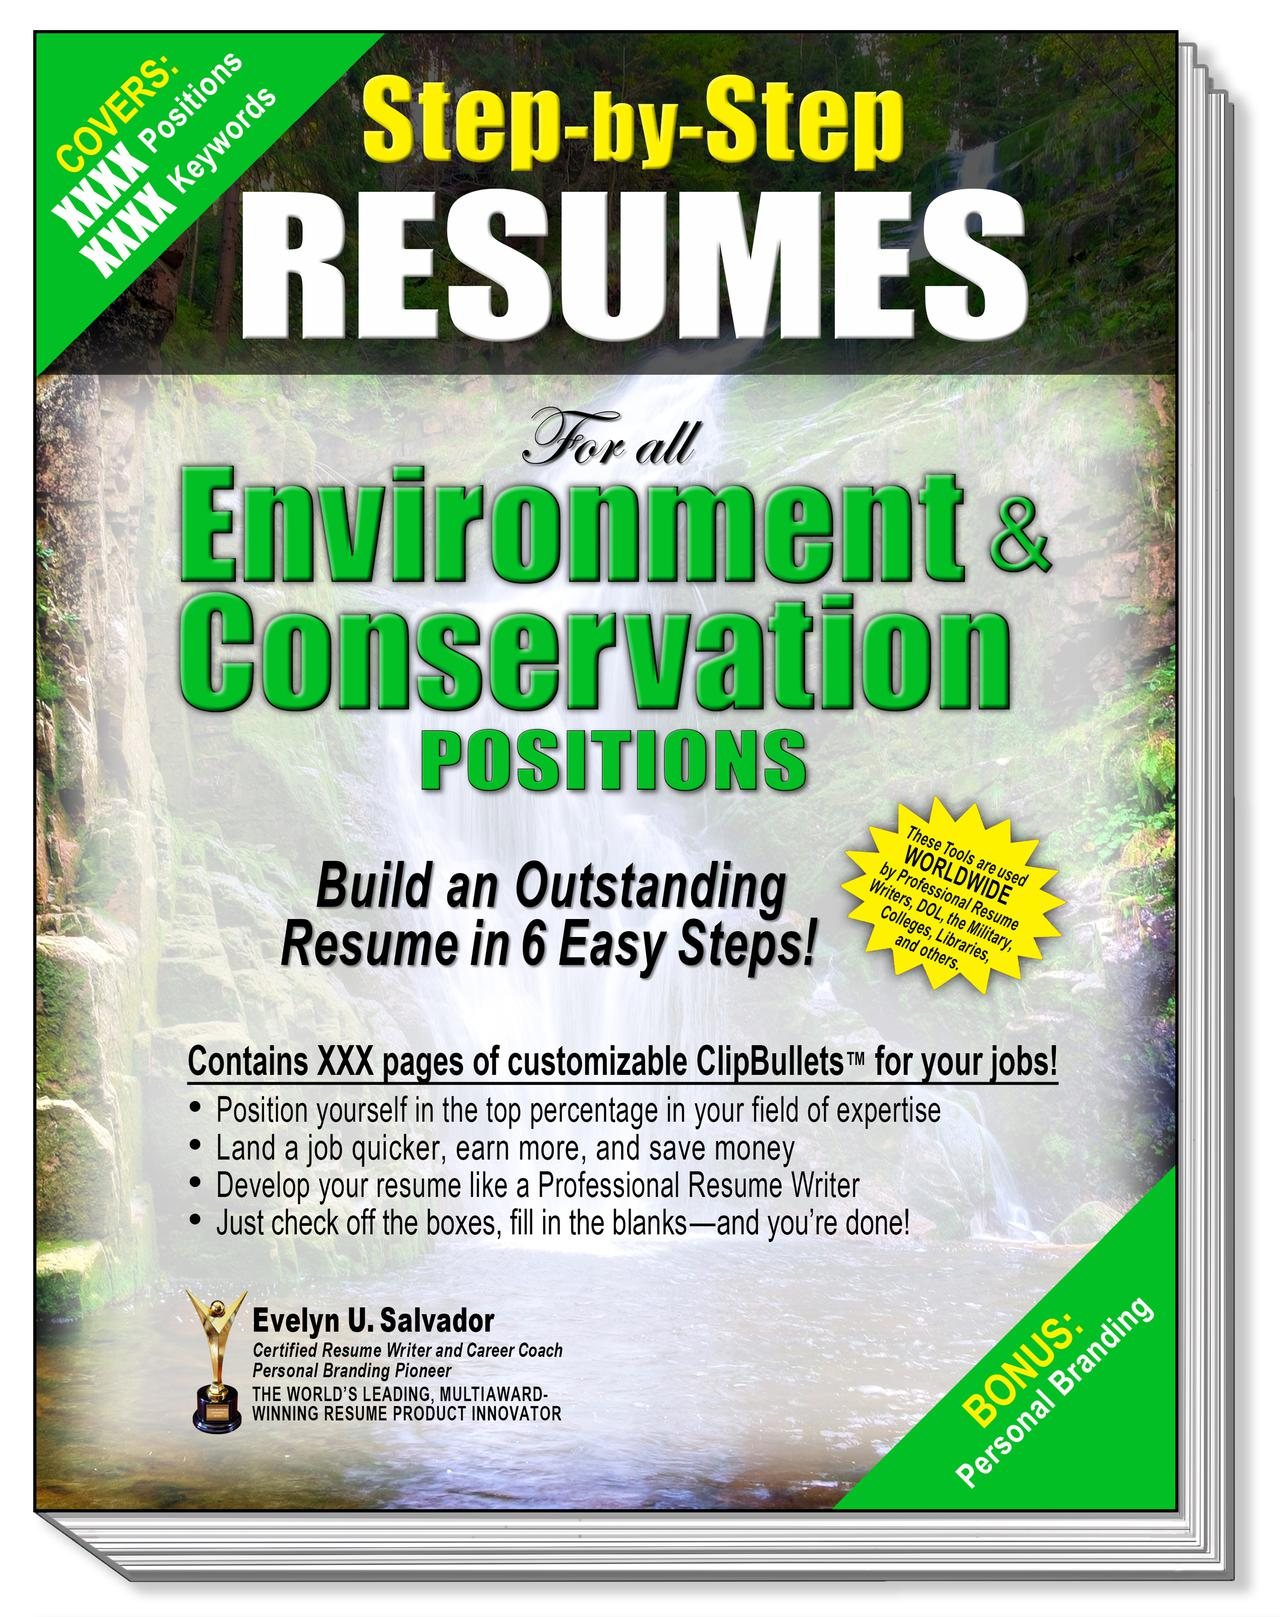 environment & conservation.jpg